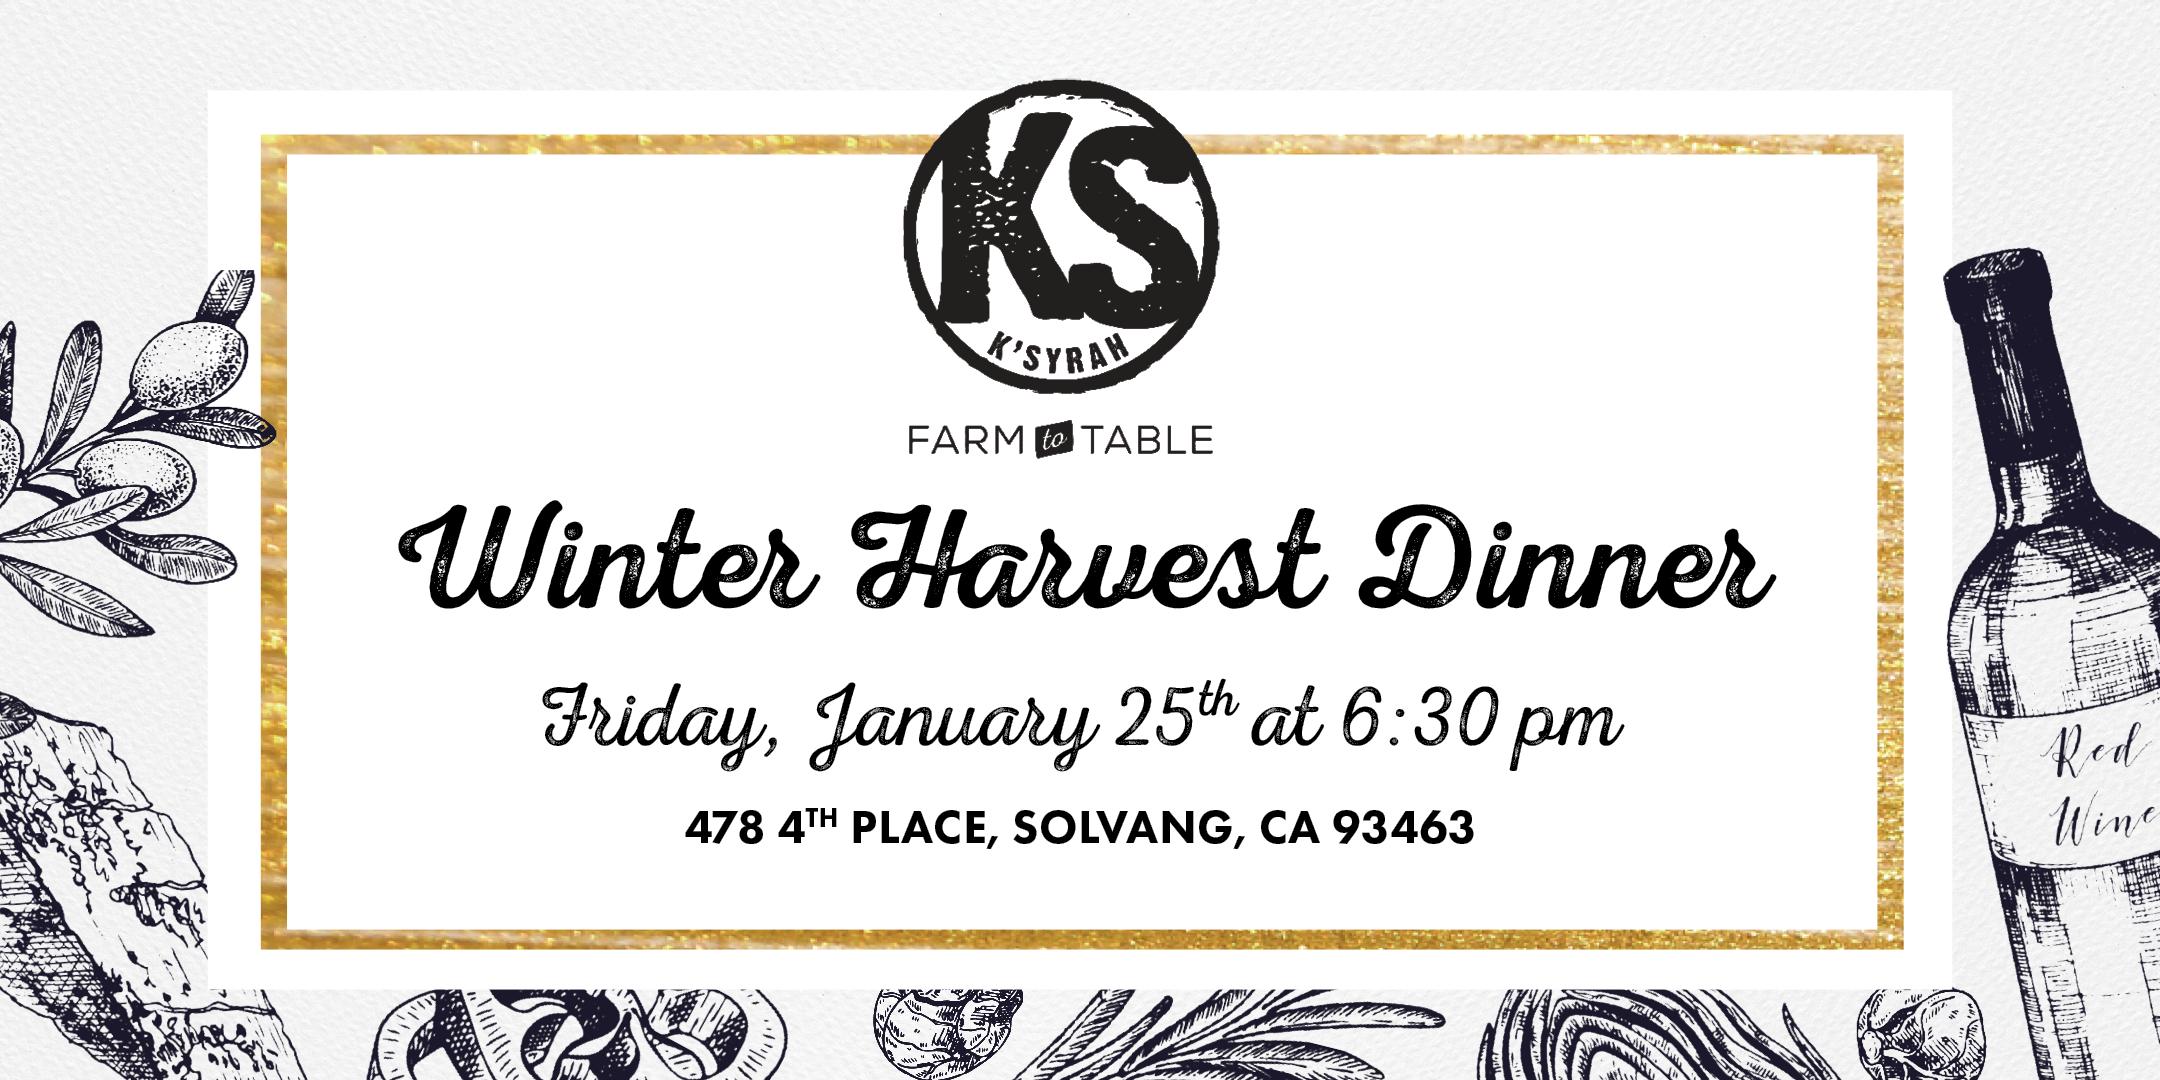 Winter Harvest Dinner_Eventbrite Cover_2160x1080.png